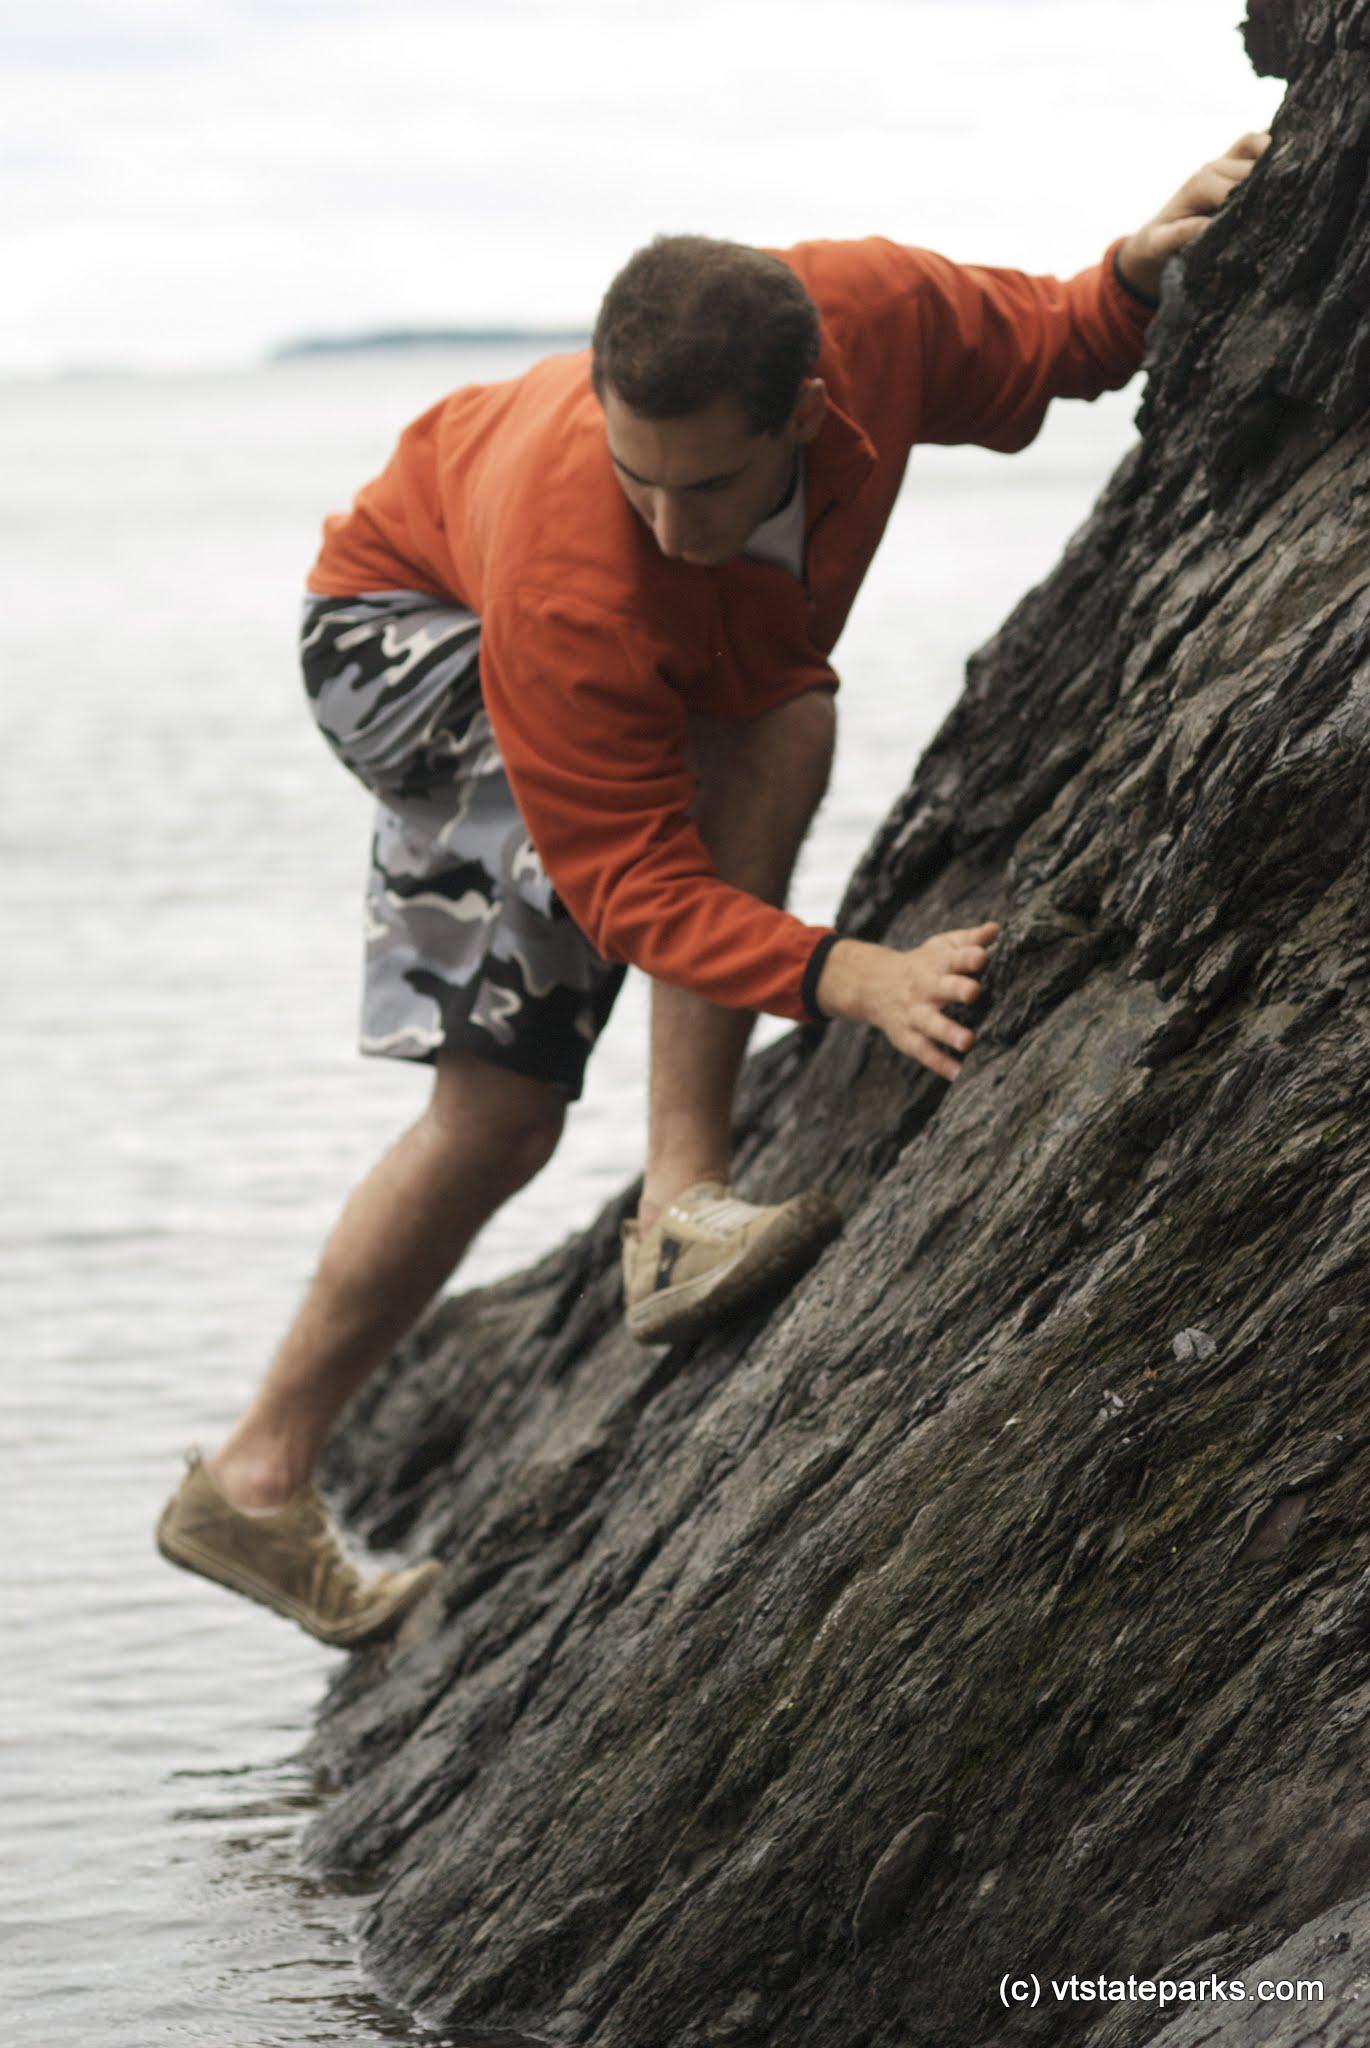 Photo: Climbing the rocks at Knight Island State Park